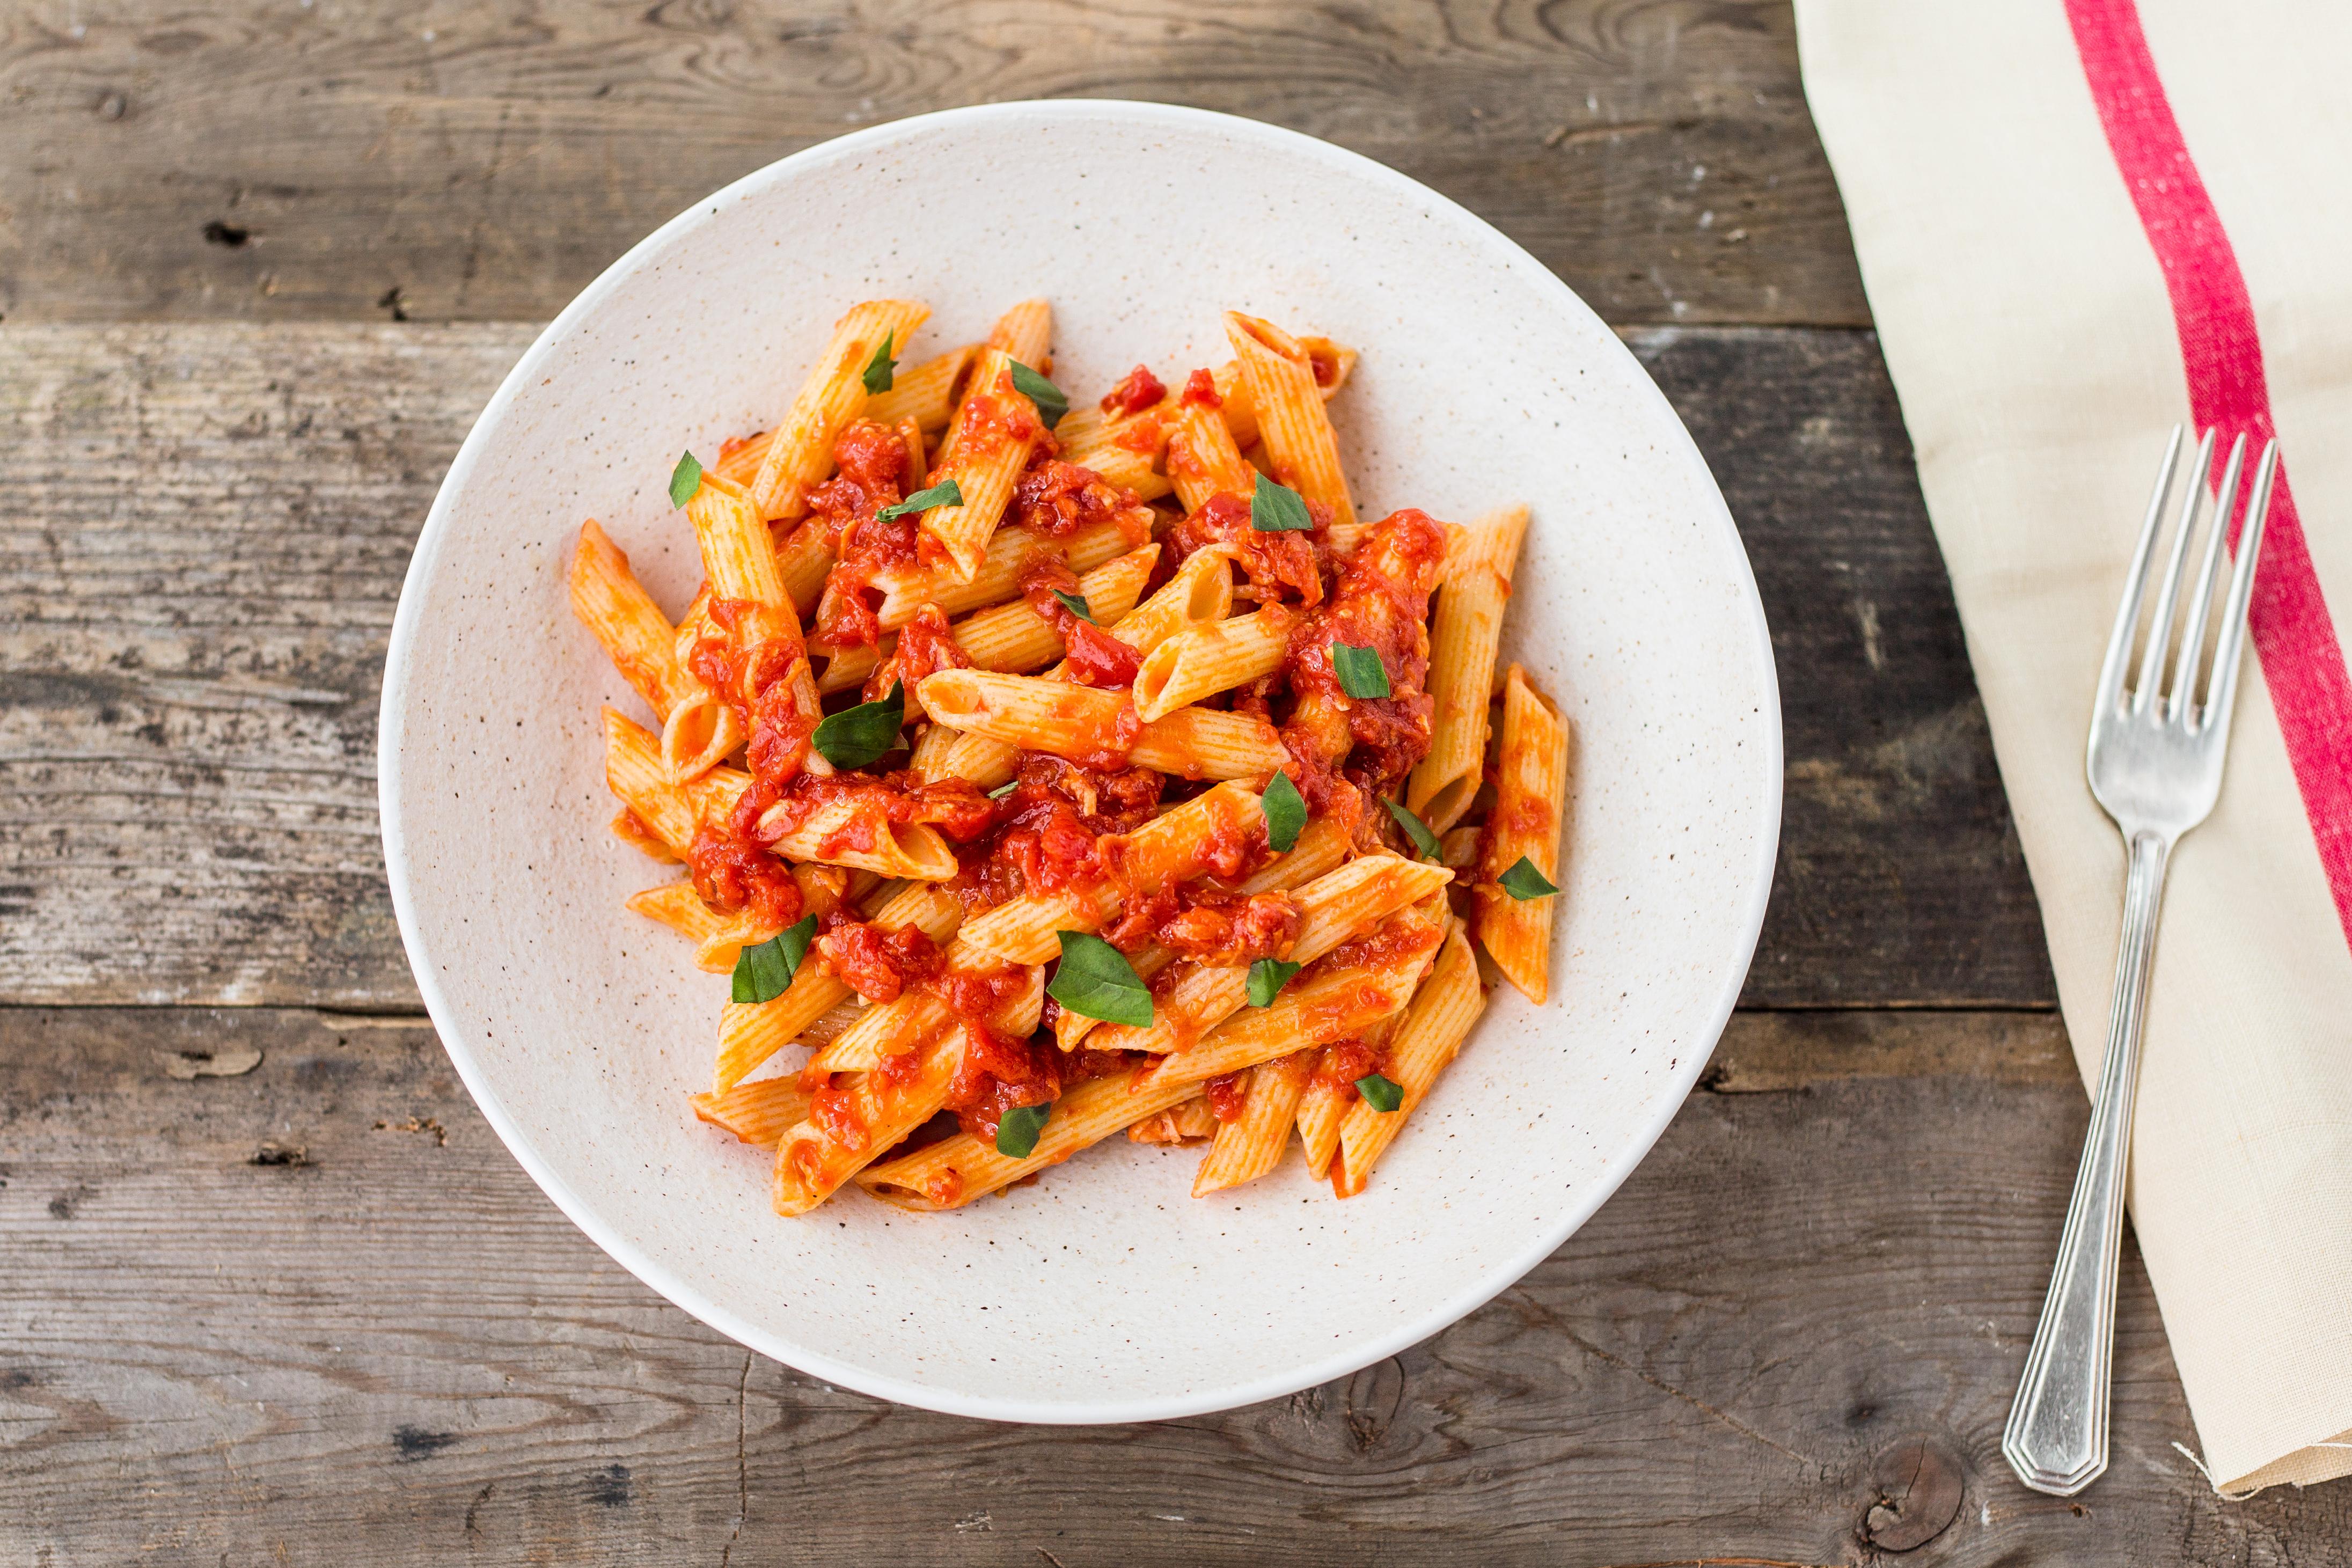 Italian Michelin Guide Results Great Italian Chefs - Emilia romagna an italian food lovers paradise